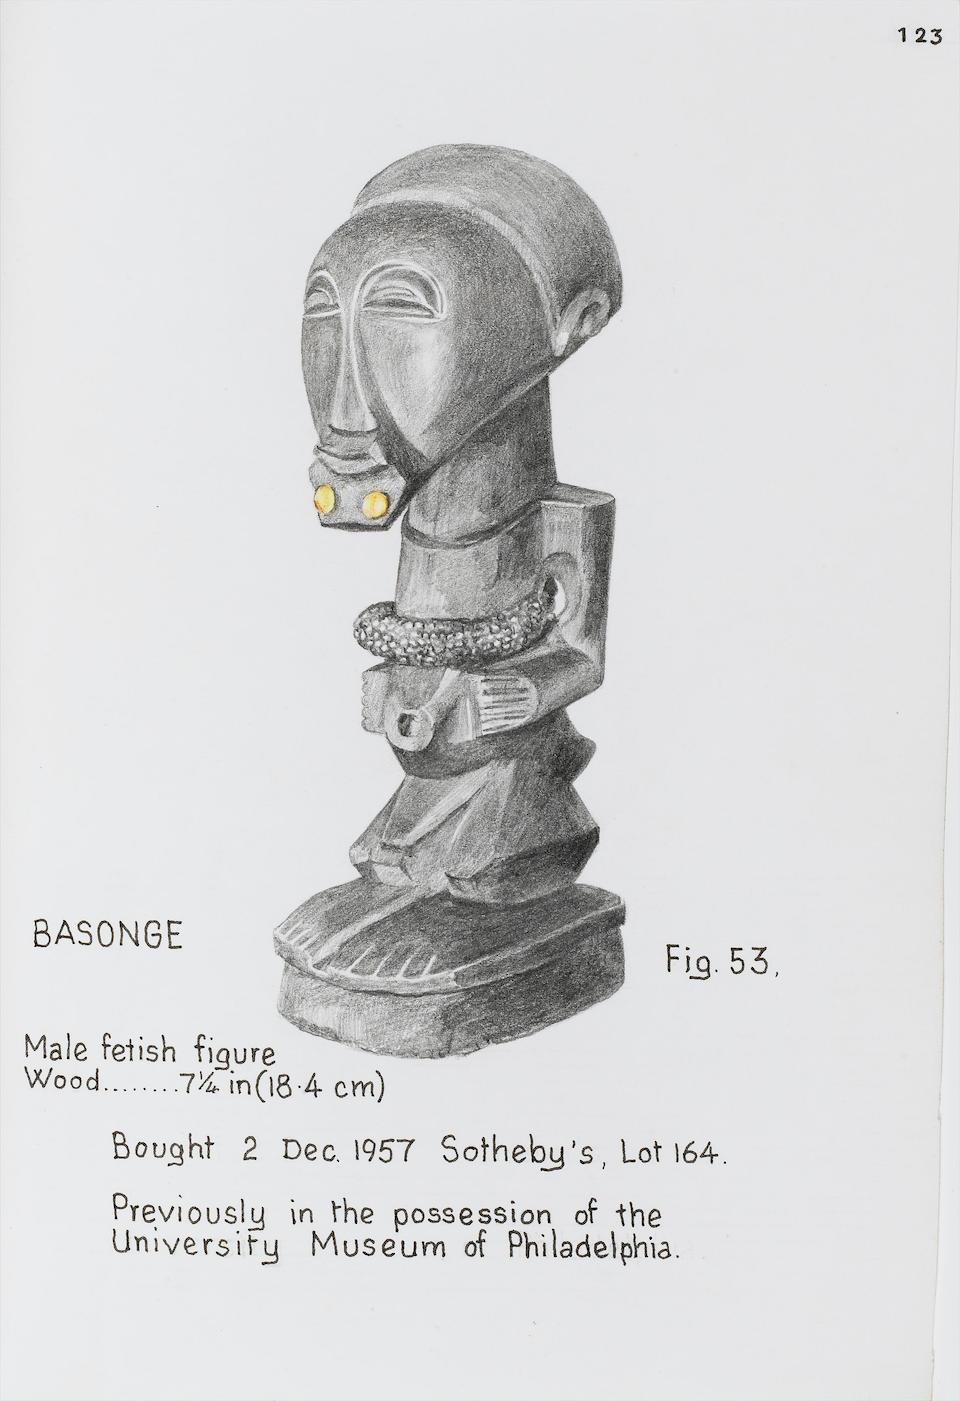 A Songye male fetish figure 18.4cm